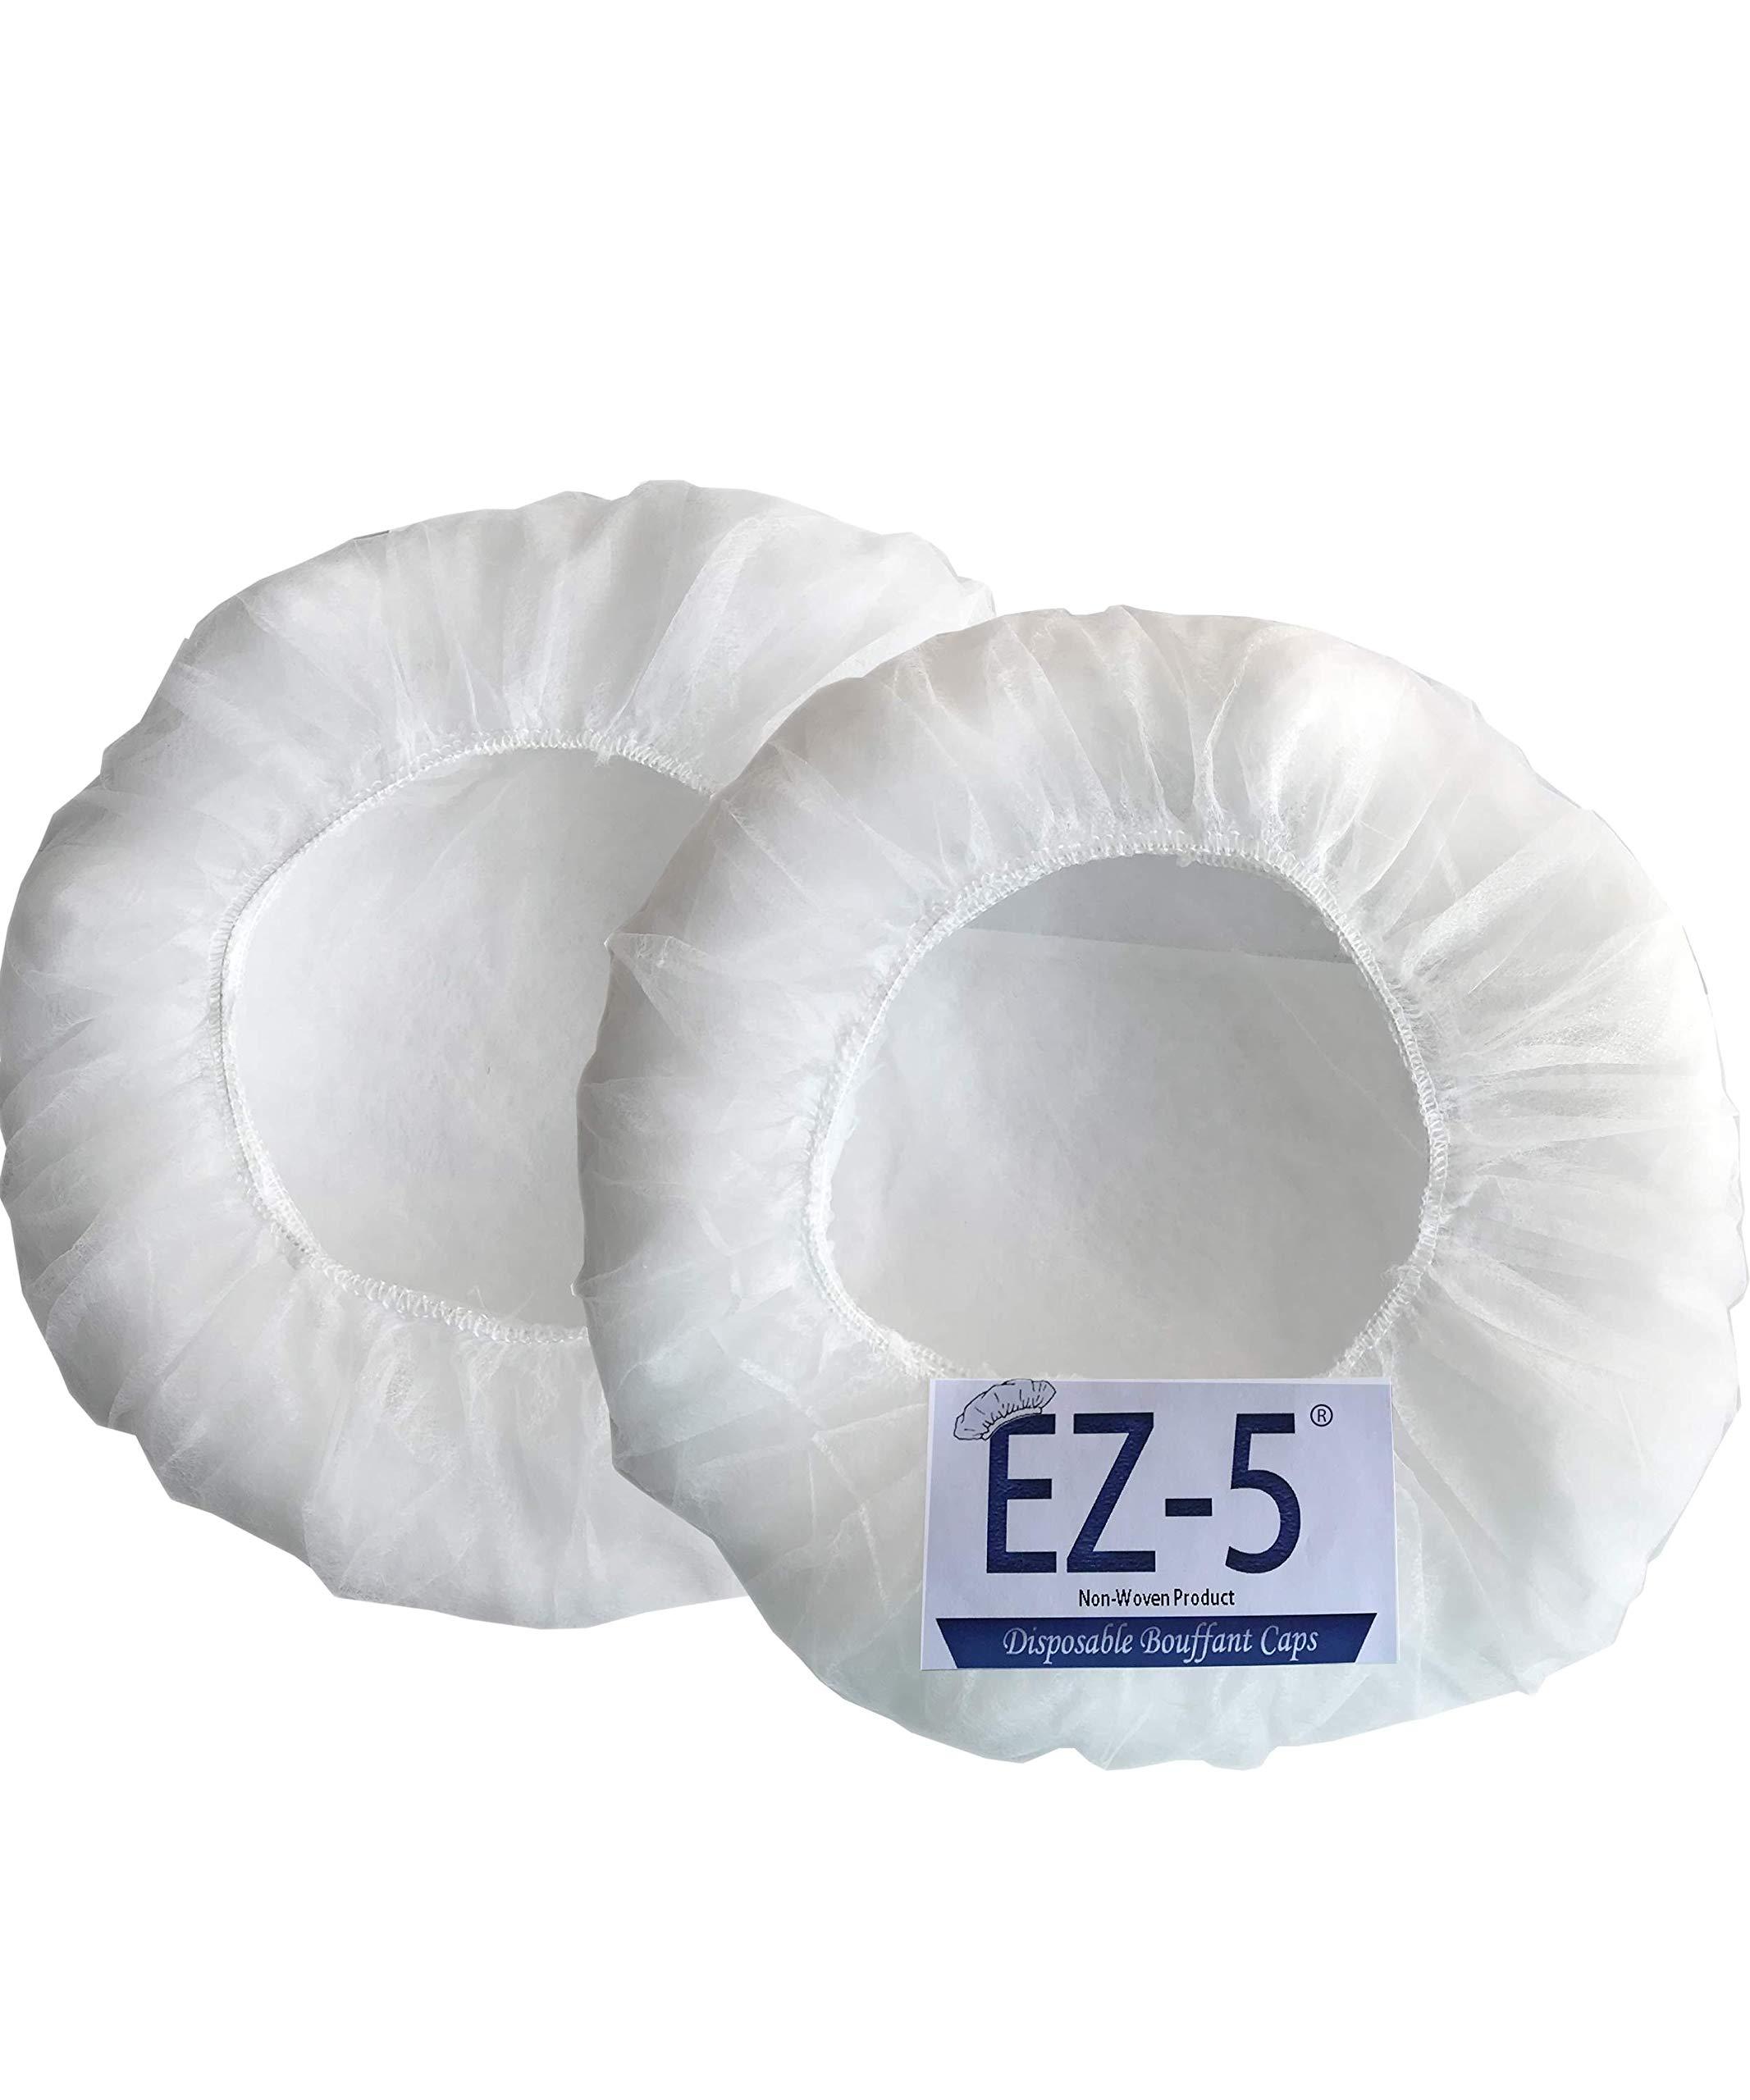 500 PCS-21'',EZ-5 Disposable Bouffant Caps, Spun-Bounded Polypropylene, Hair Head Cover Net, Non-Woven, Medical, Labs, Nurse, Tattoo, Food Service, Health, Hospital-White